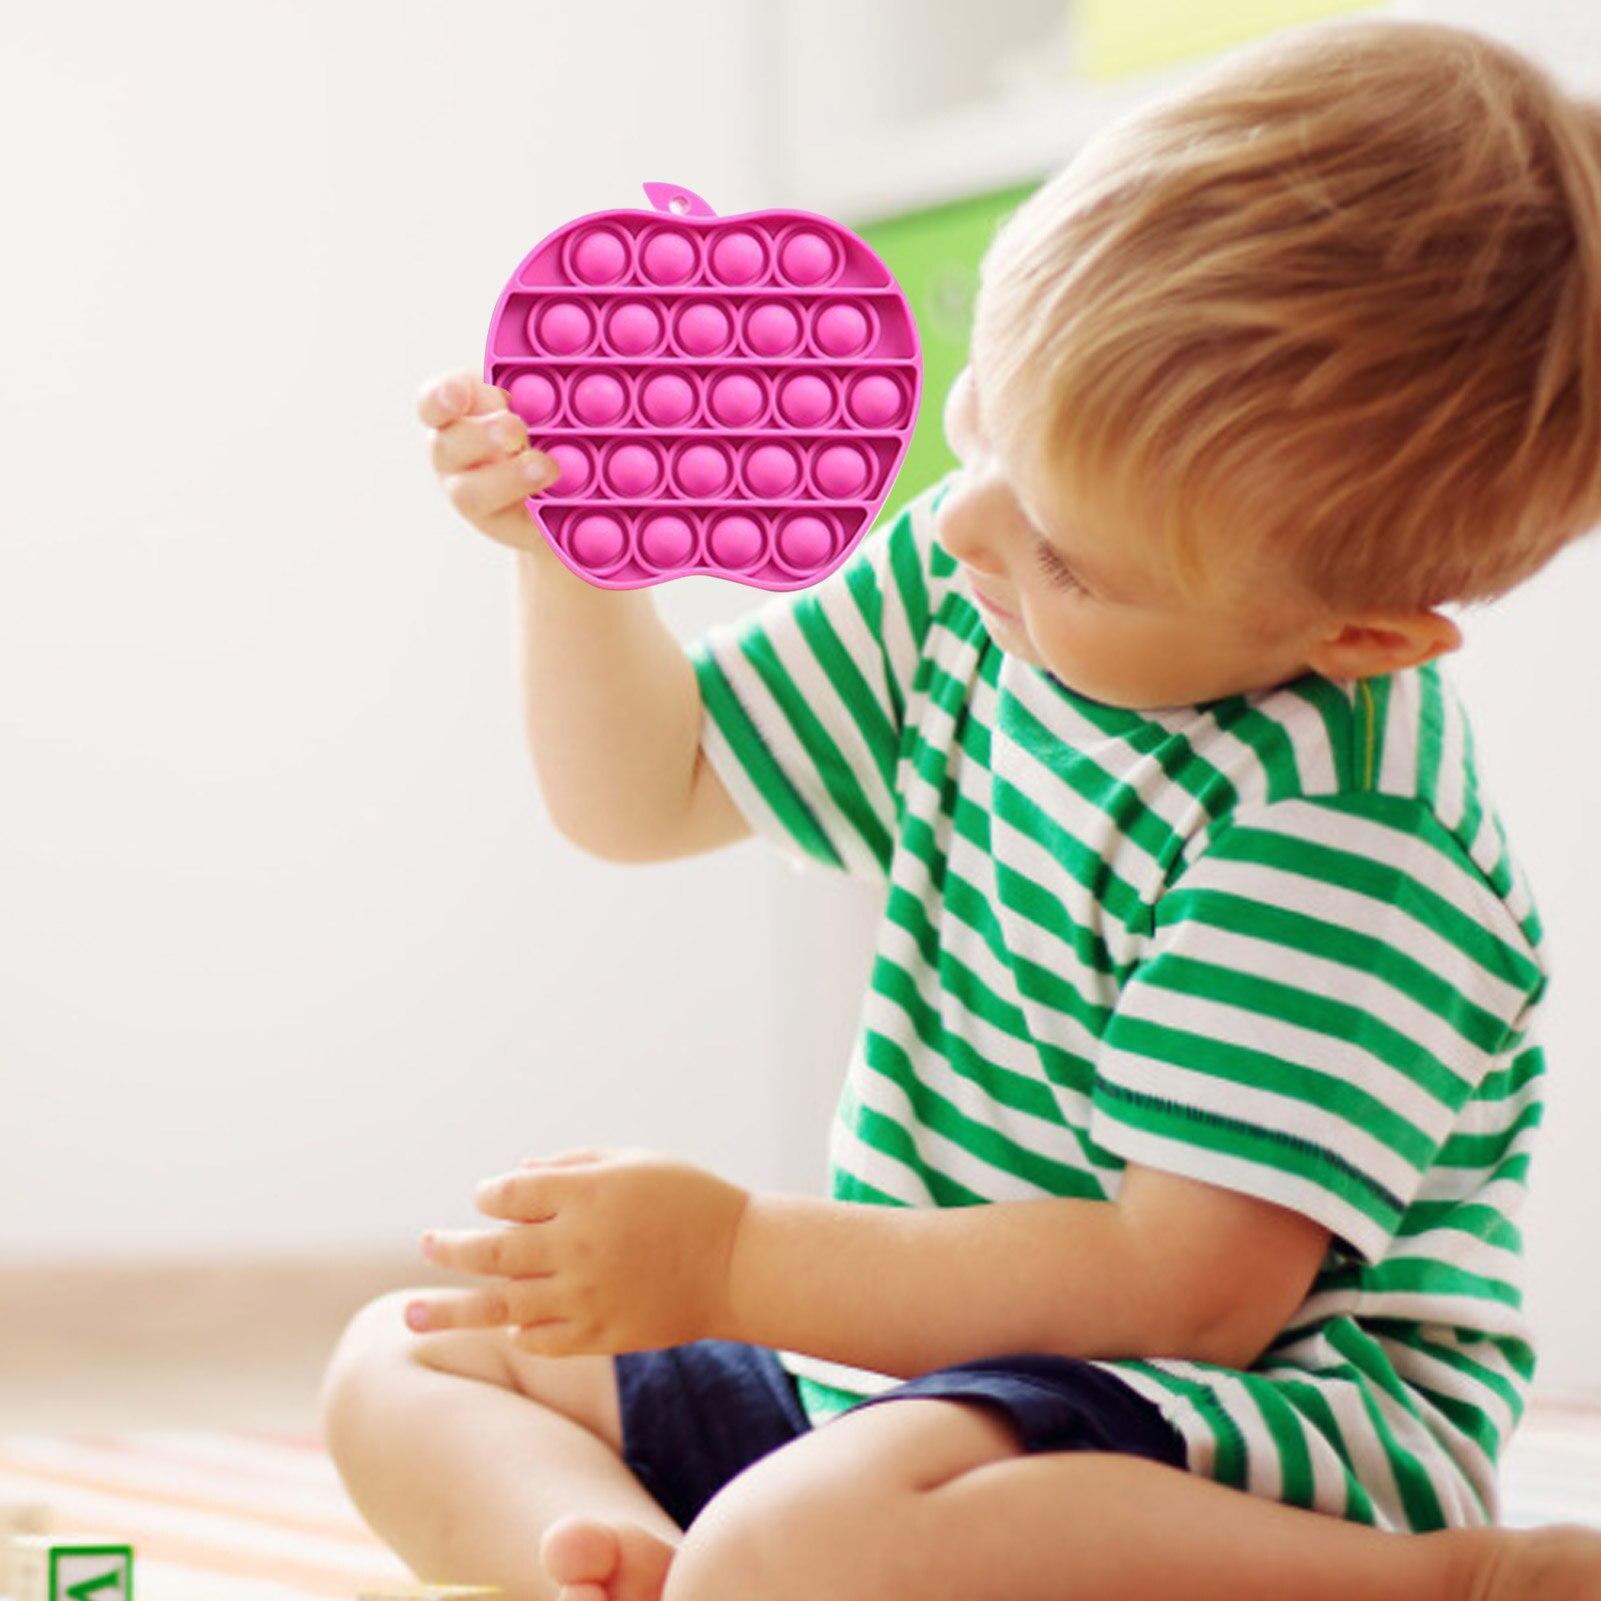 Adult Toys Fidget Rainbow Bubble-Sensory Squishy Pop-It Push-Pops Needs Anti-Stress Children img3